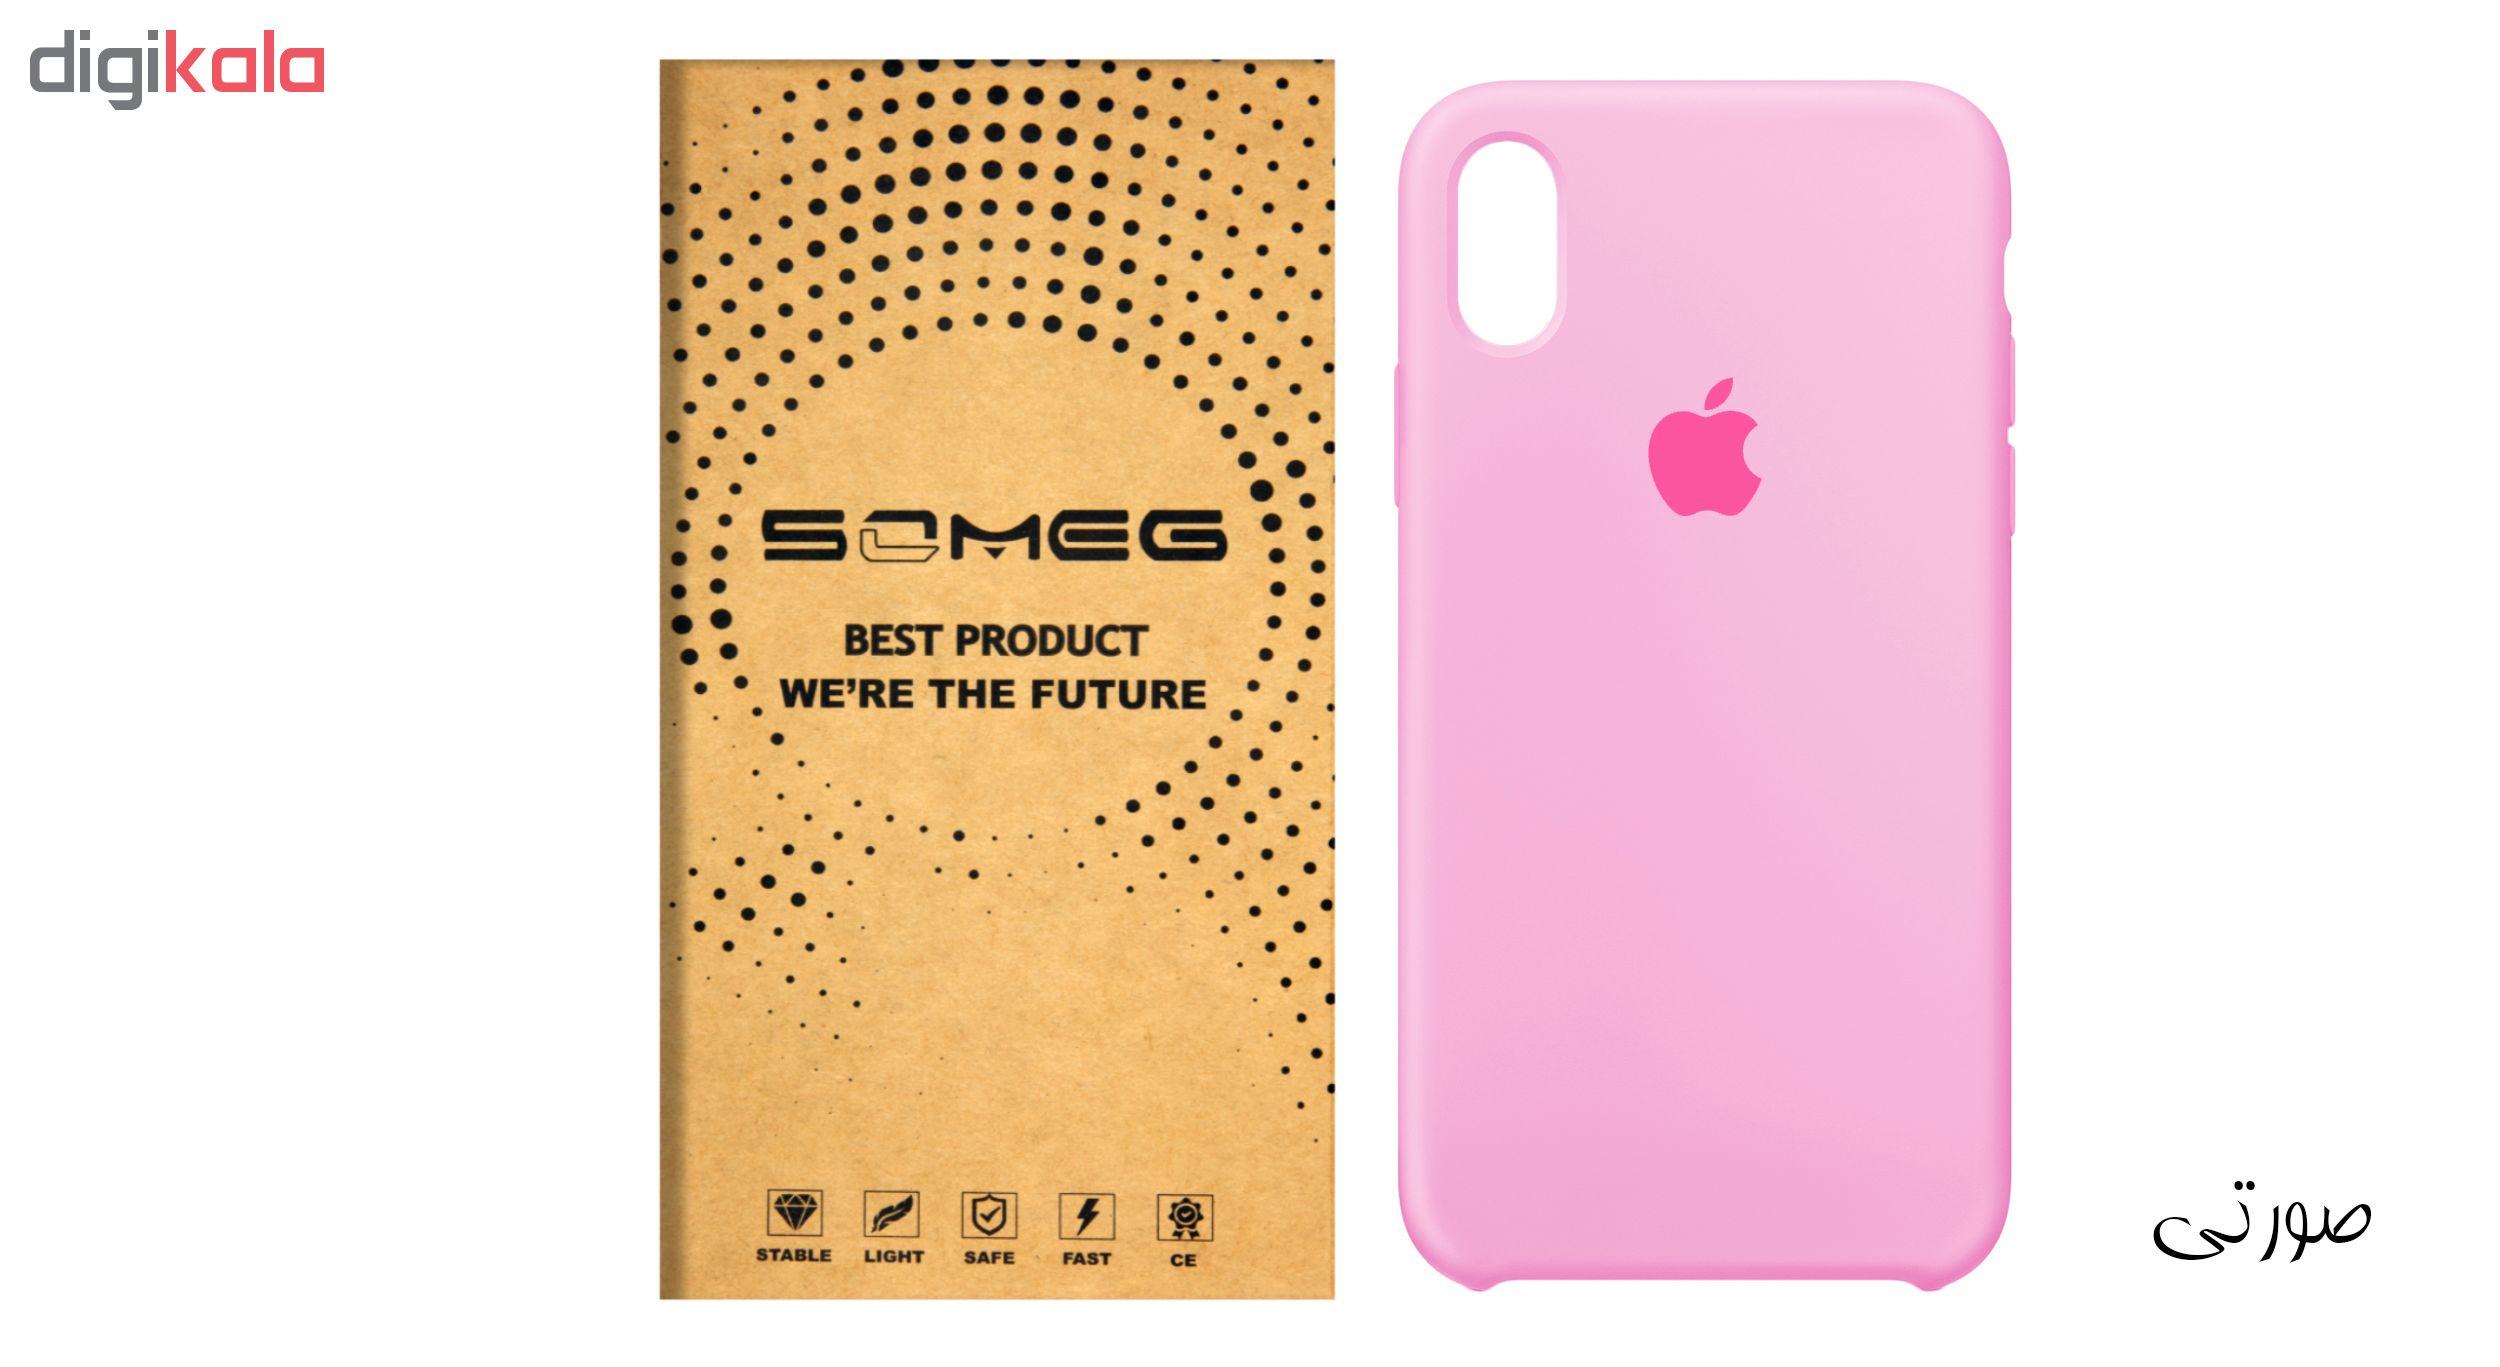 کاور سومگ مدل SIC مناسب برای گوشی موبایل اپل iPhone X  main 1 18